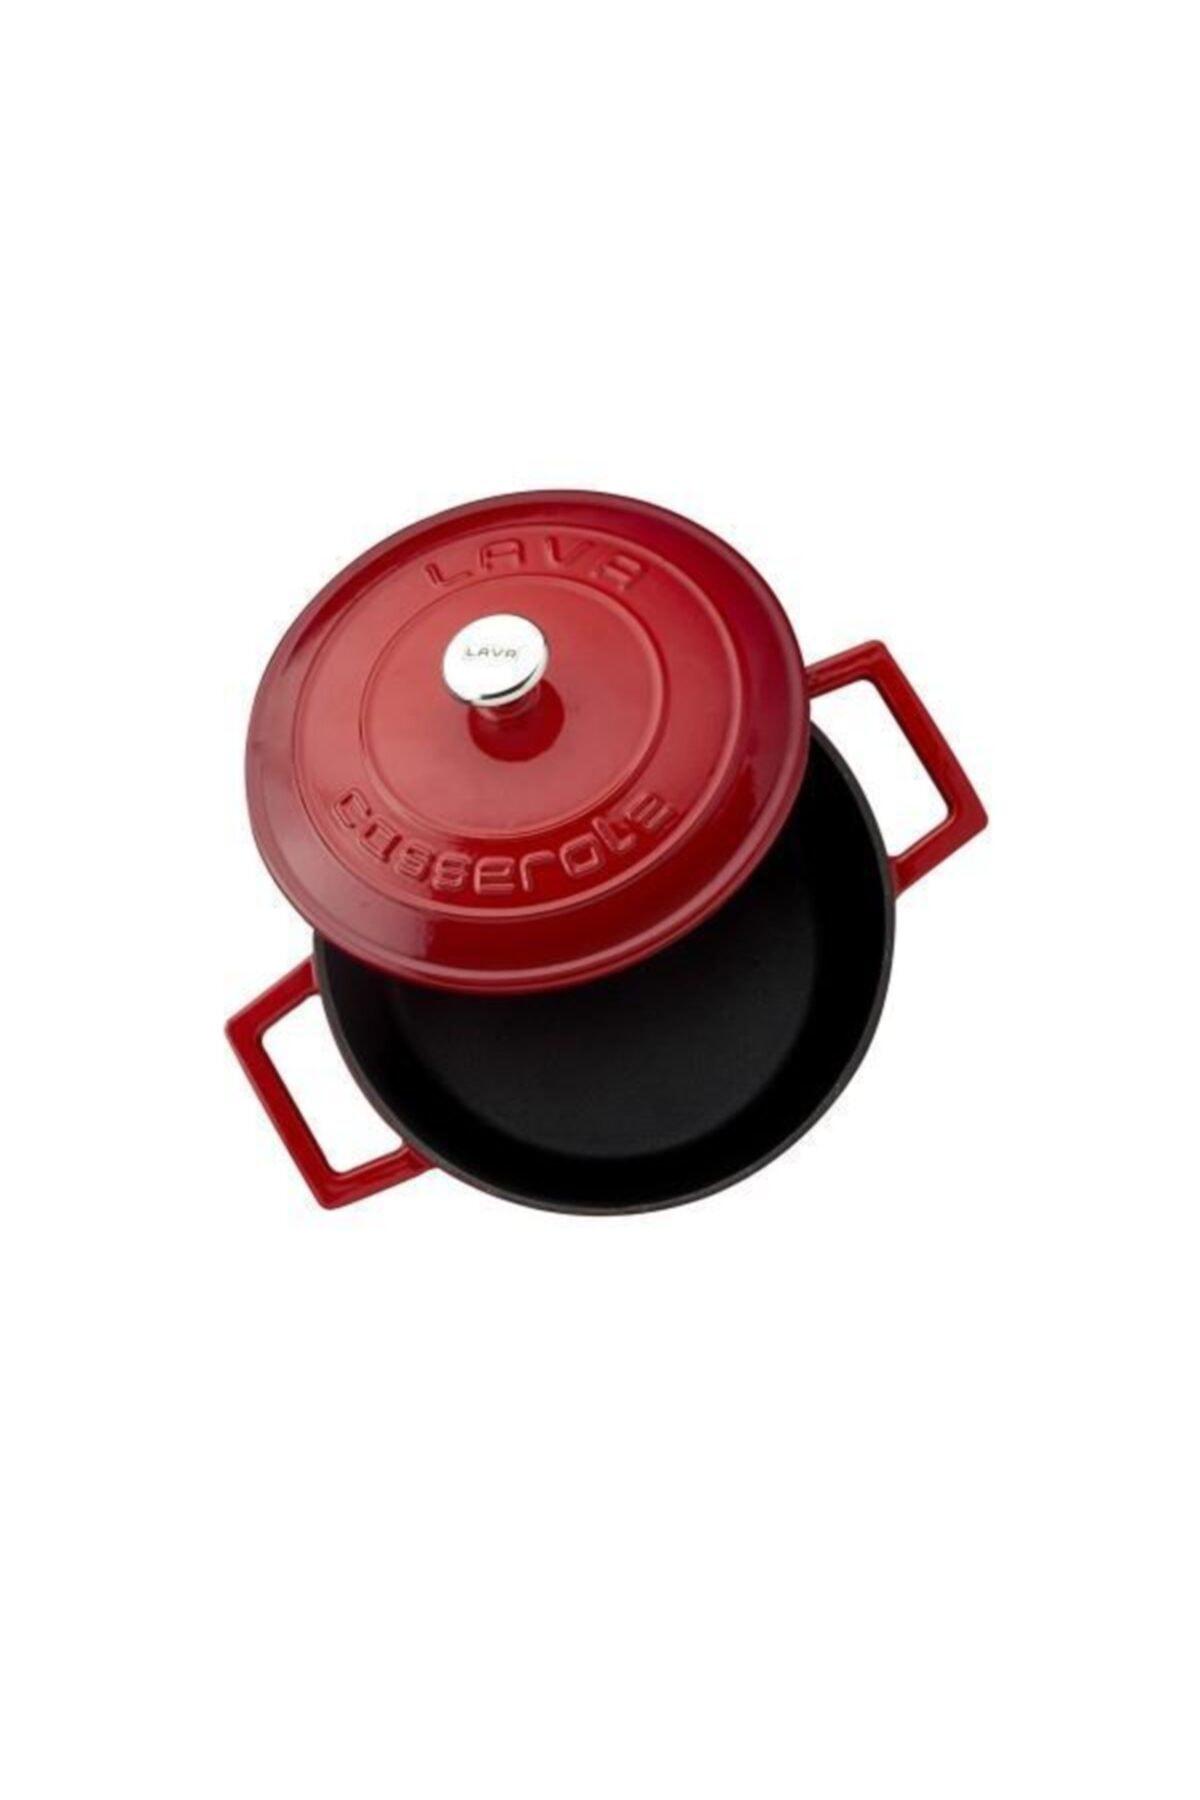 Lava Kırmızı Yuvarlak Döküm Tencere 20 cm Lvytc220k1r 2